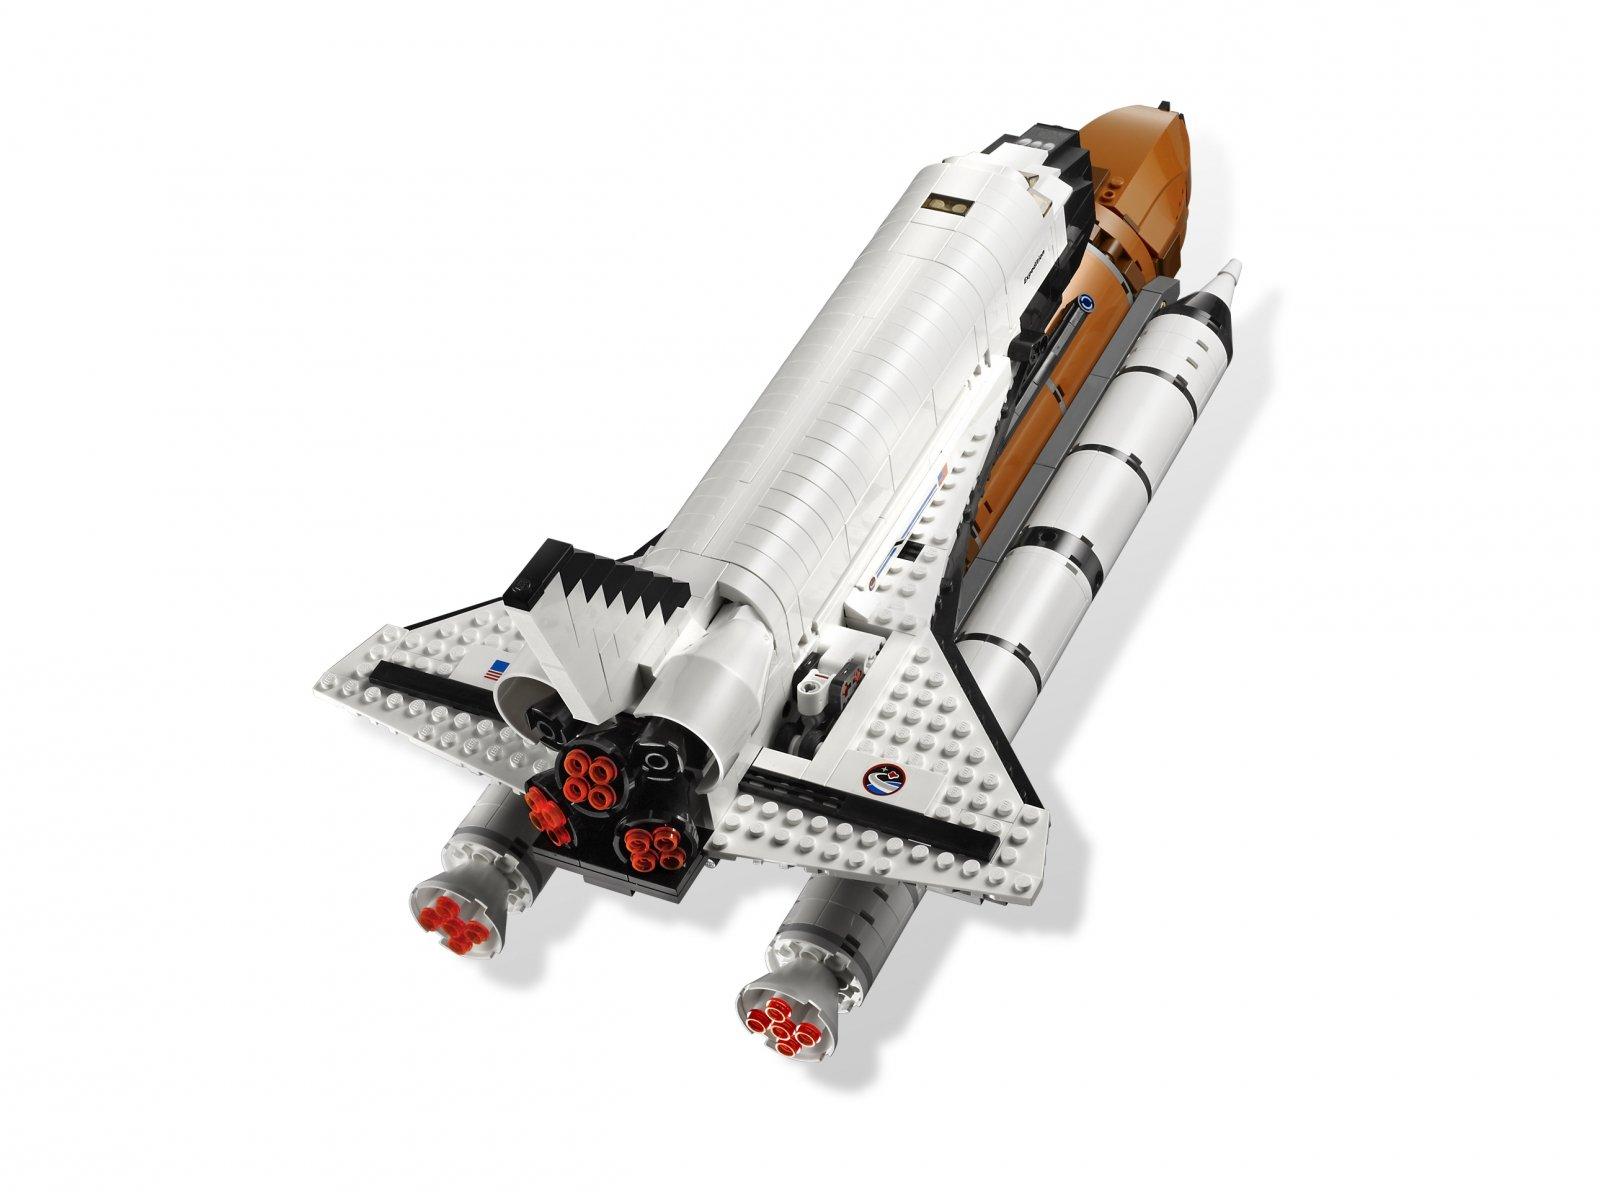 LEGO 10231 Creator Expert Ekspedycja kosmiczna